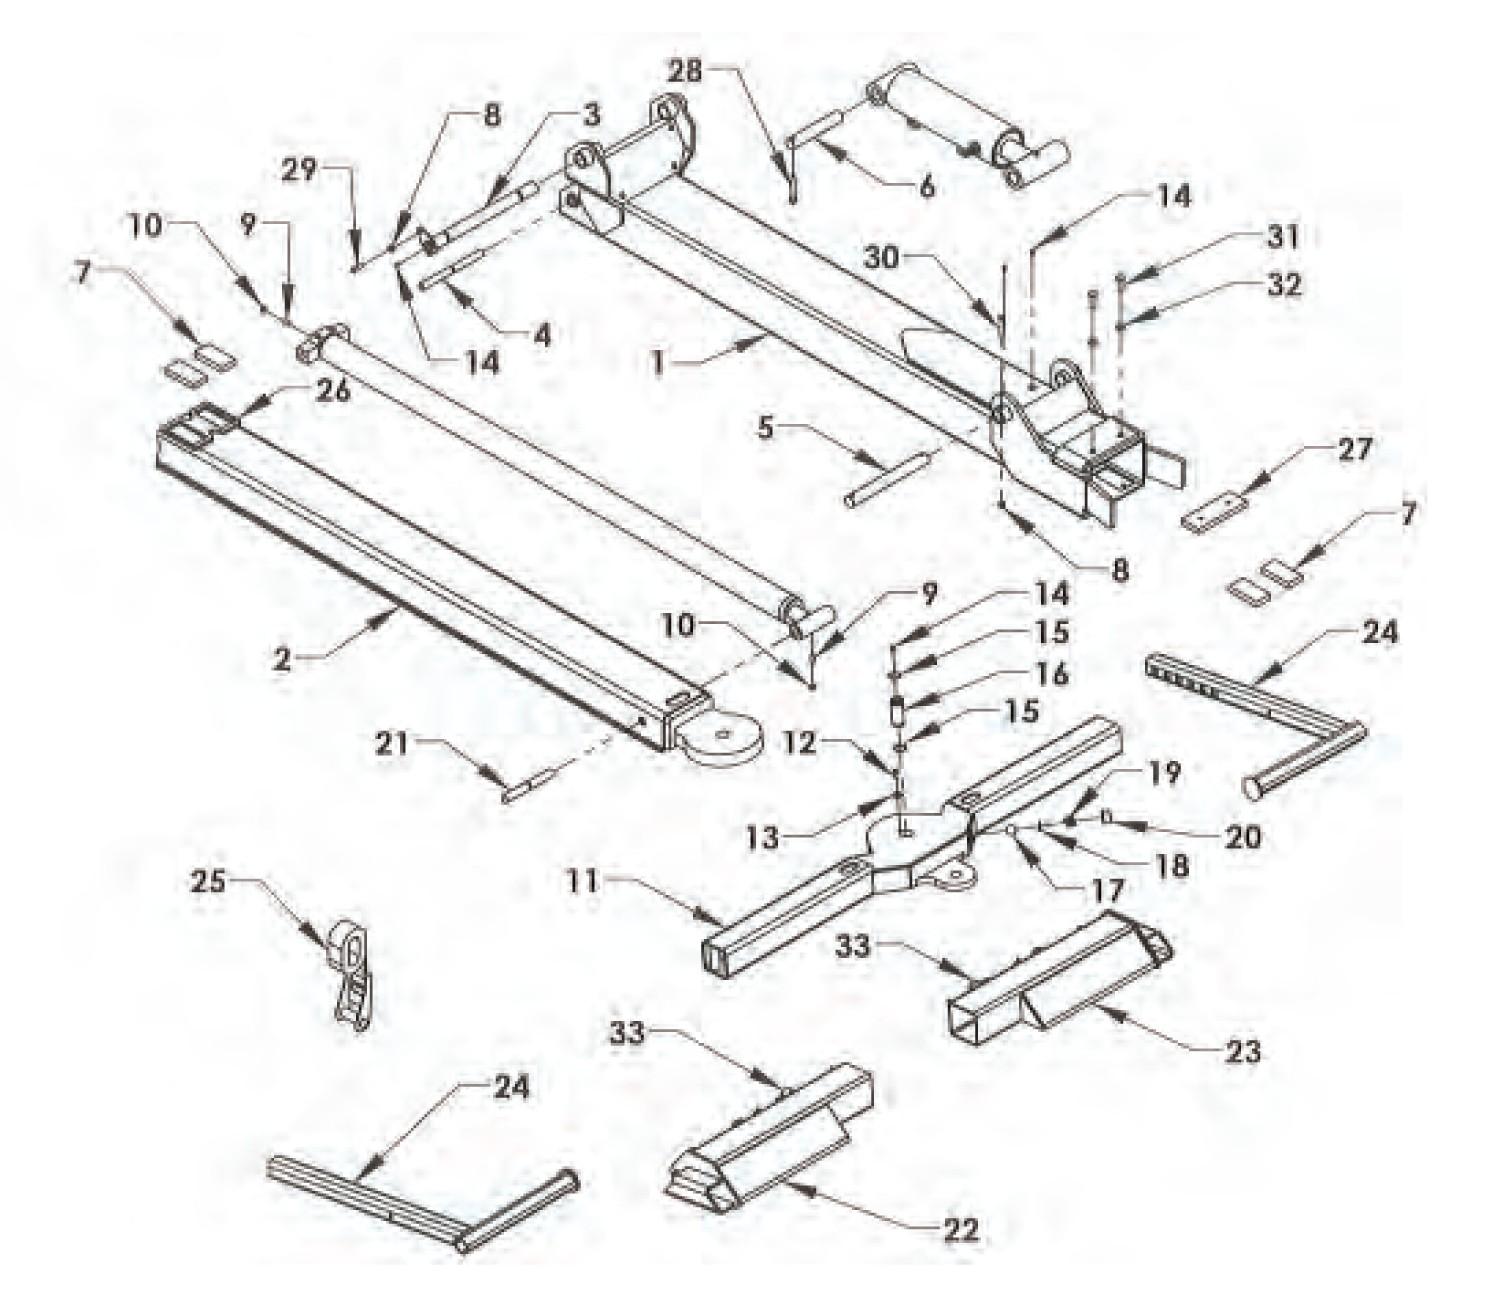 Car Wheel assembly Diagram Wheel Lift & Wheel Retainer assembly Of Car Wheel assembly Diagram